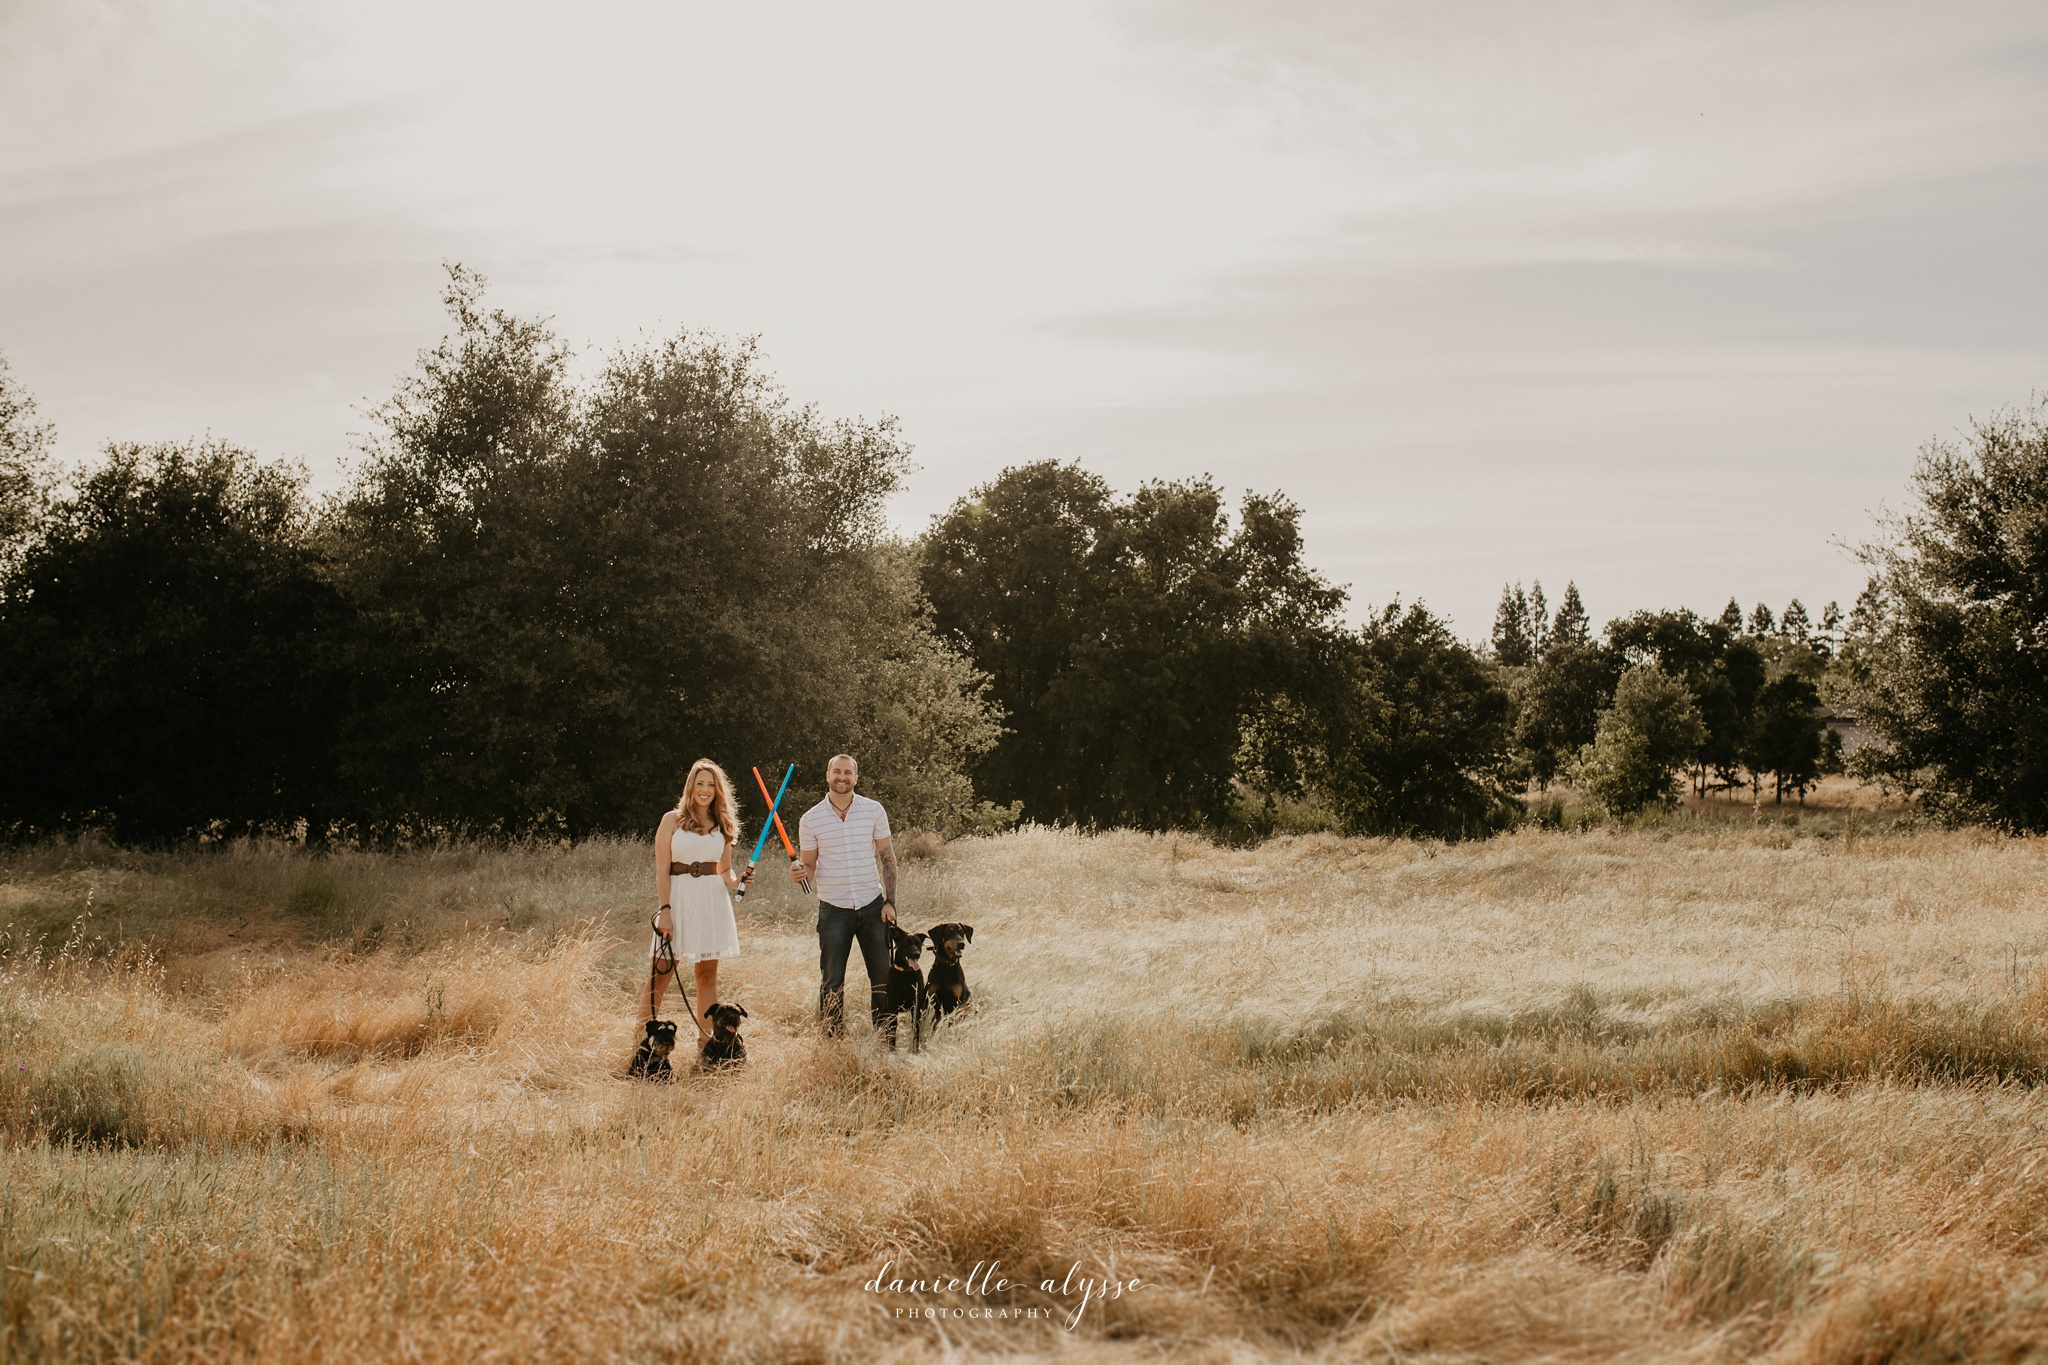 180520_engagement_sarah_jon_dogs_danielle_alysse_photography_elk_grove_photographer_blog_1_WEB.jpg